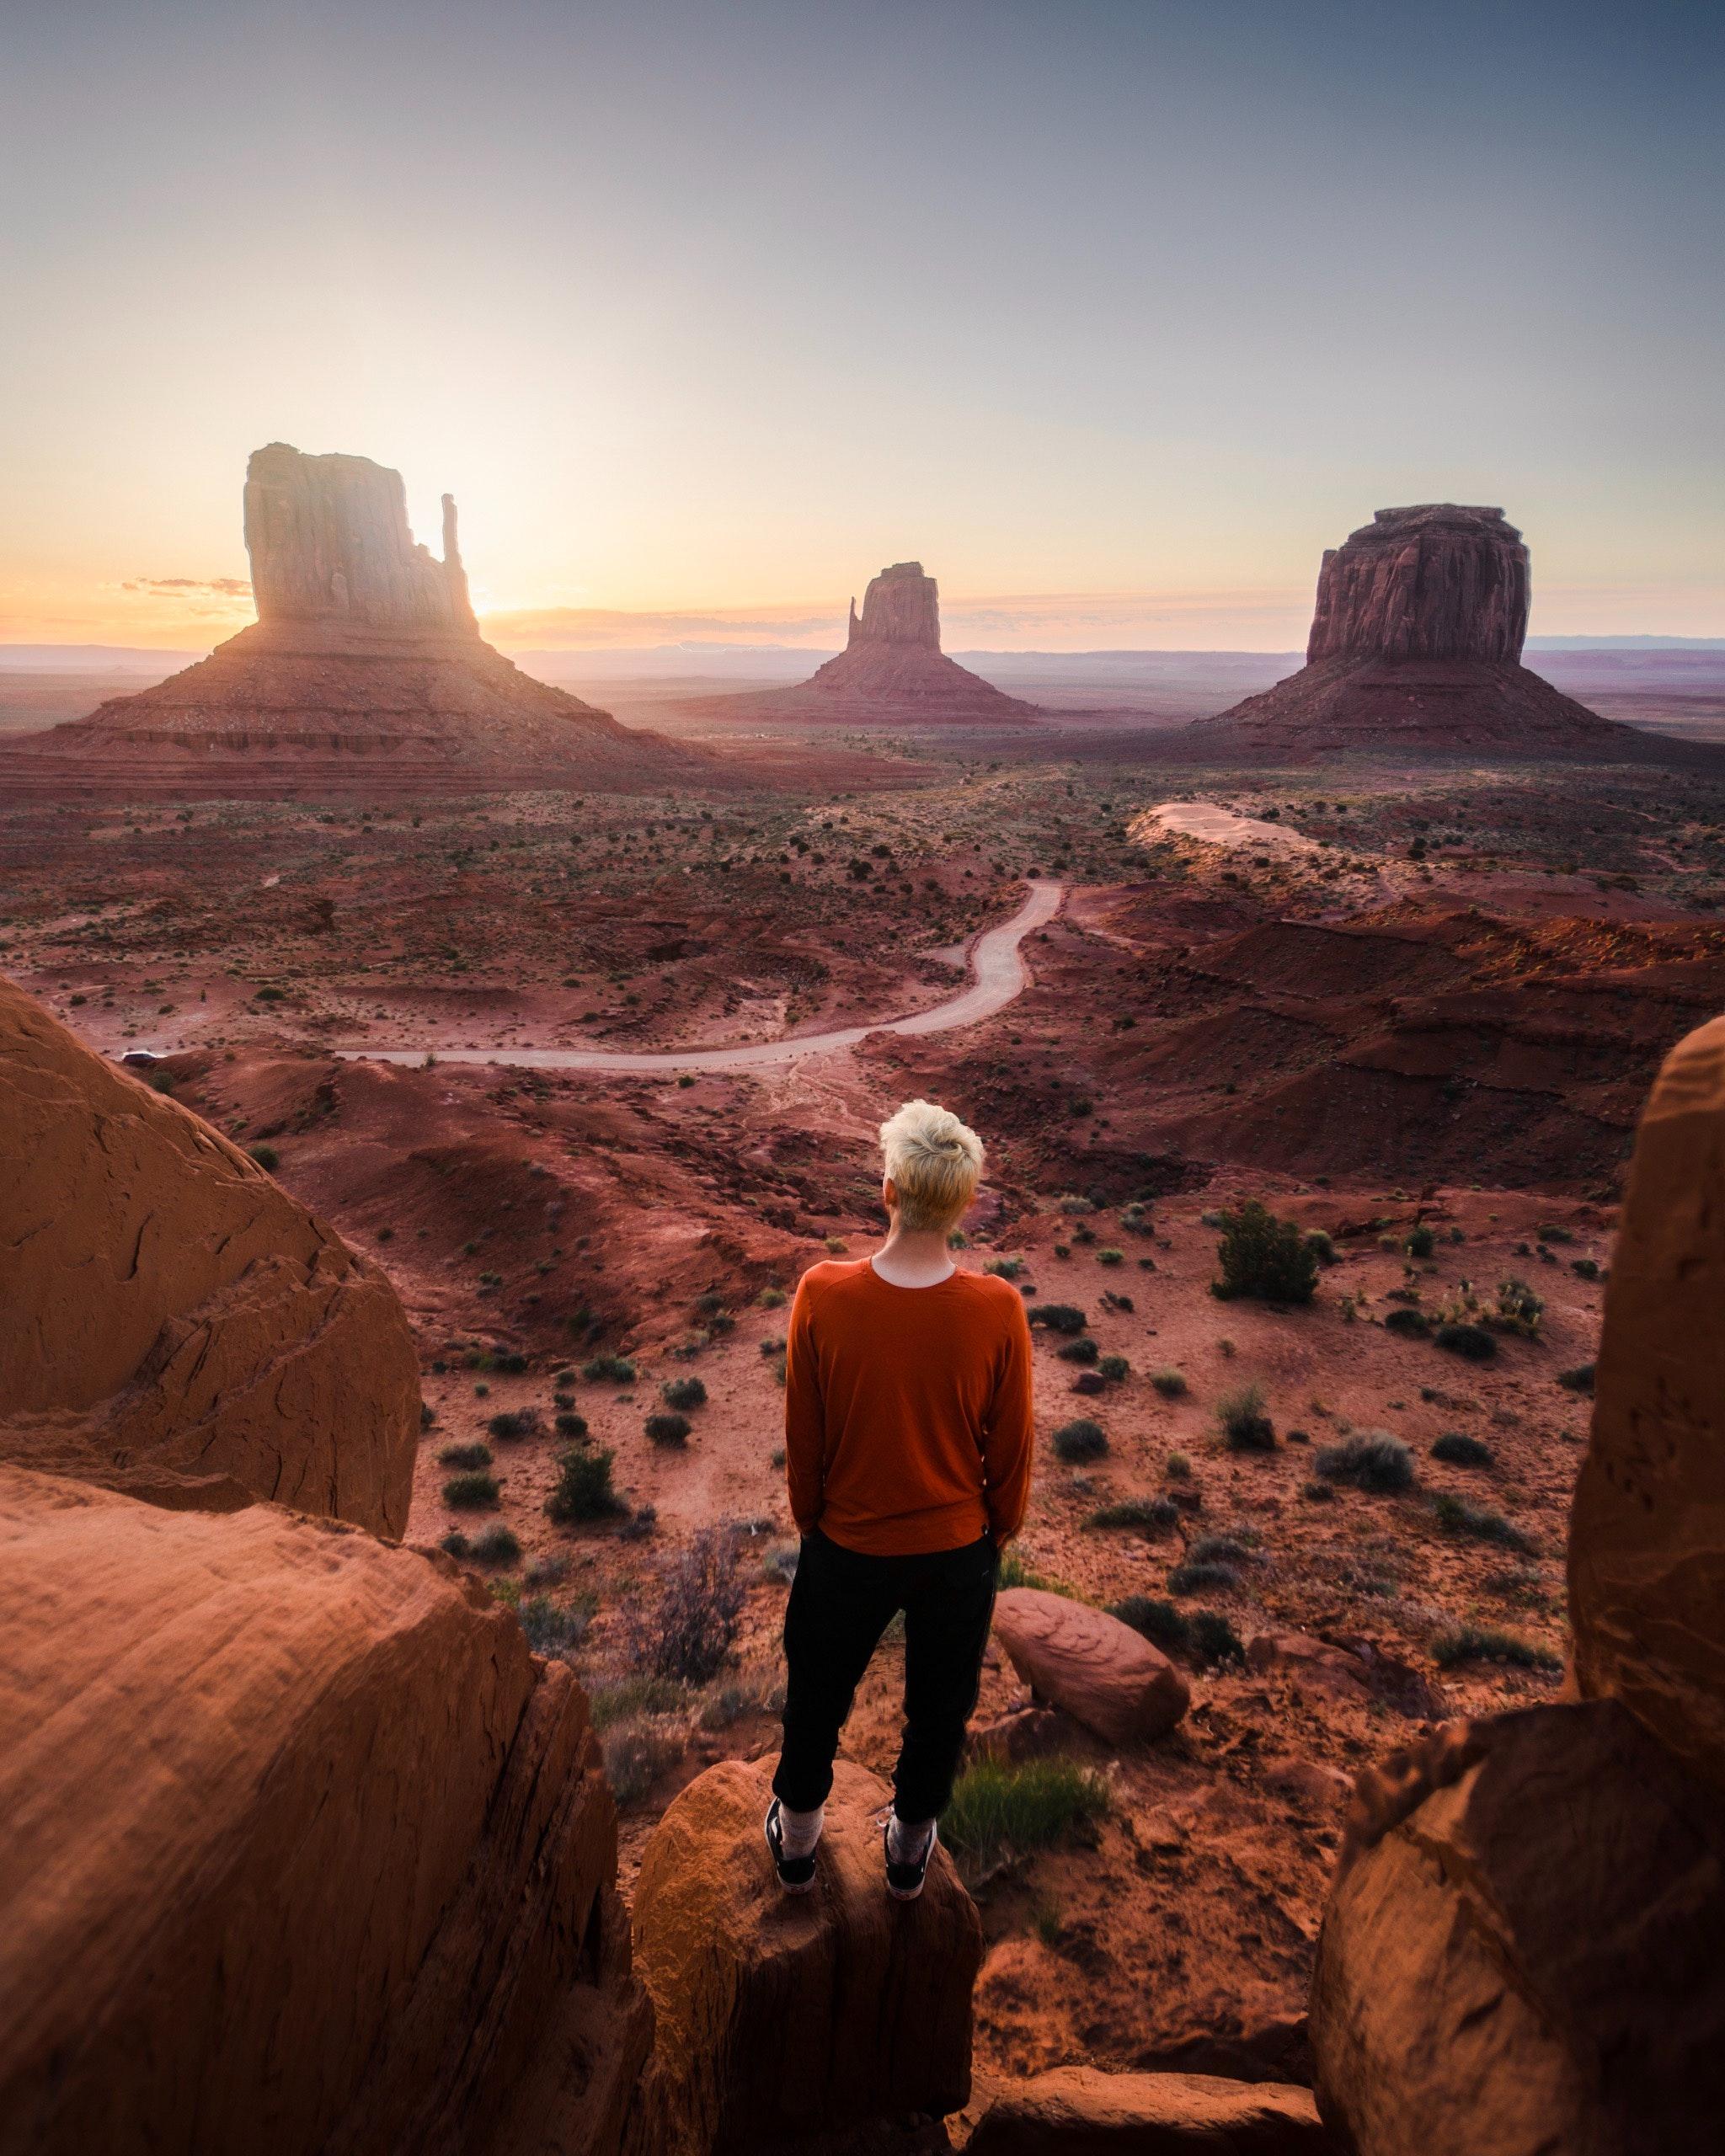 adventure-arid-bushes-2379864.jpg